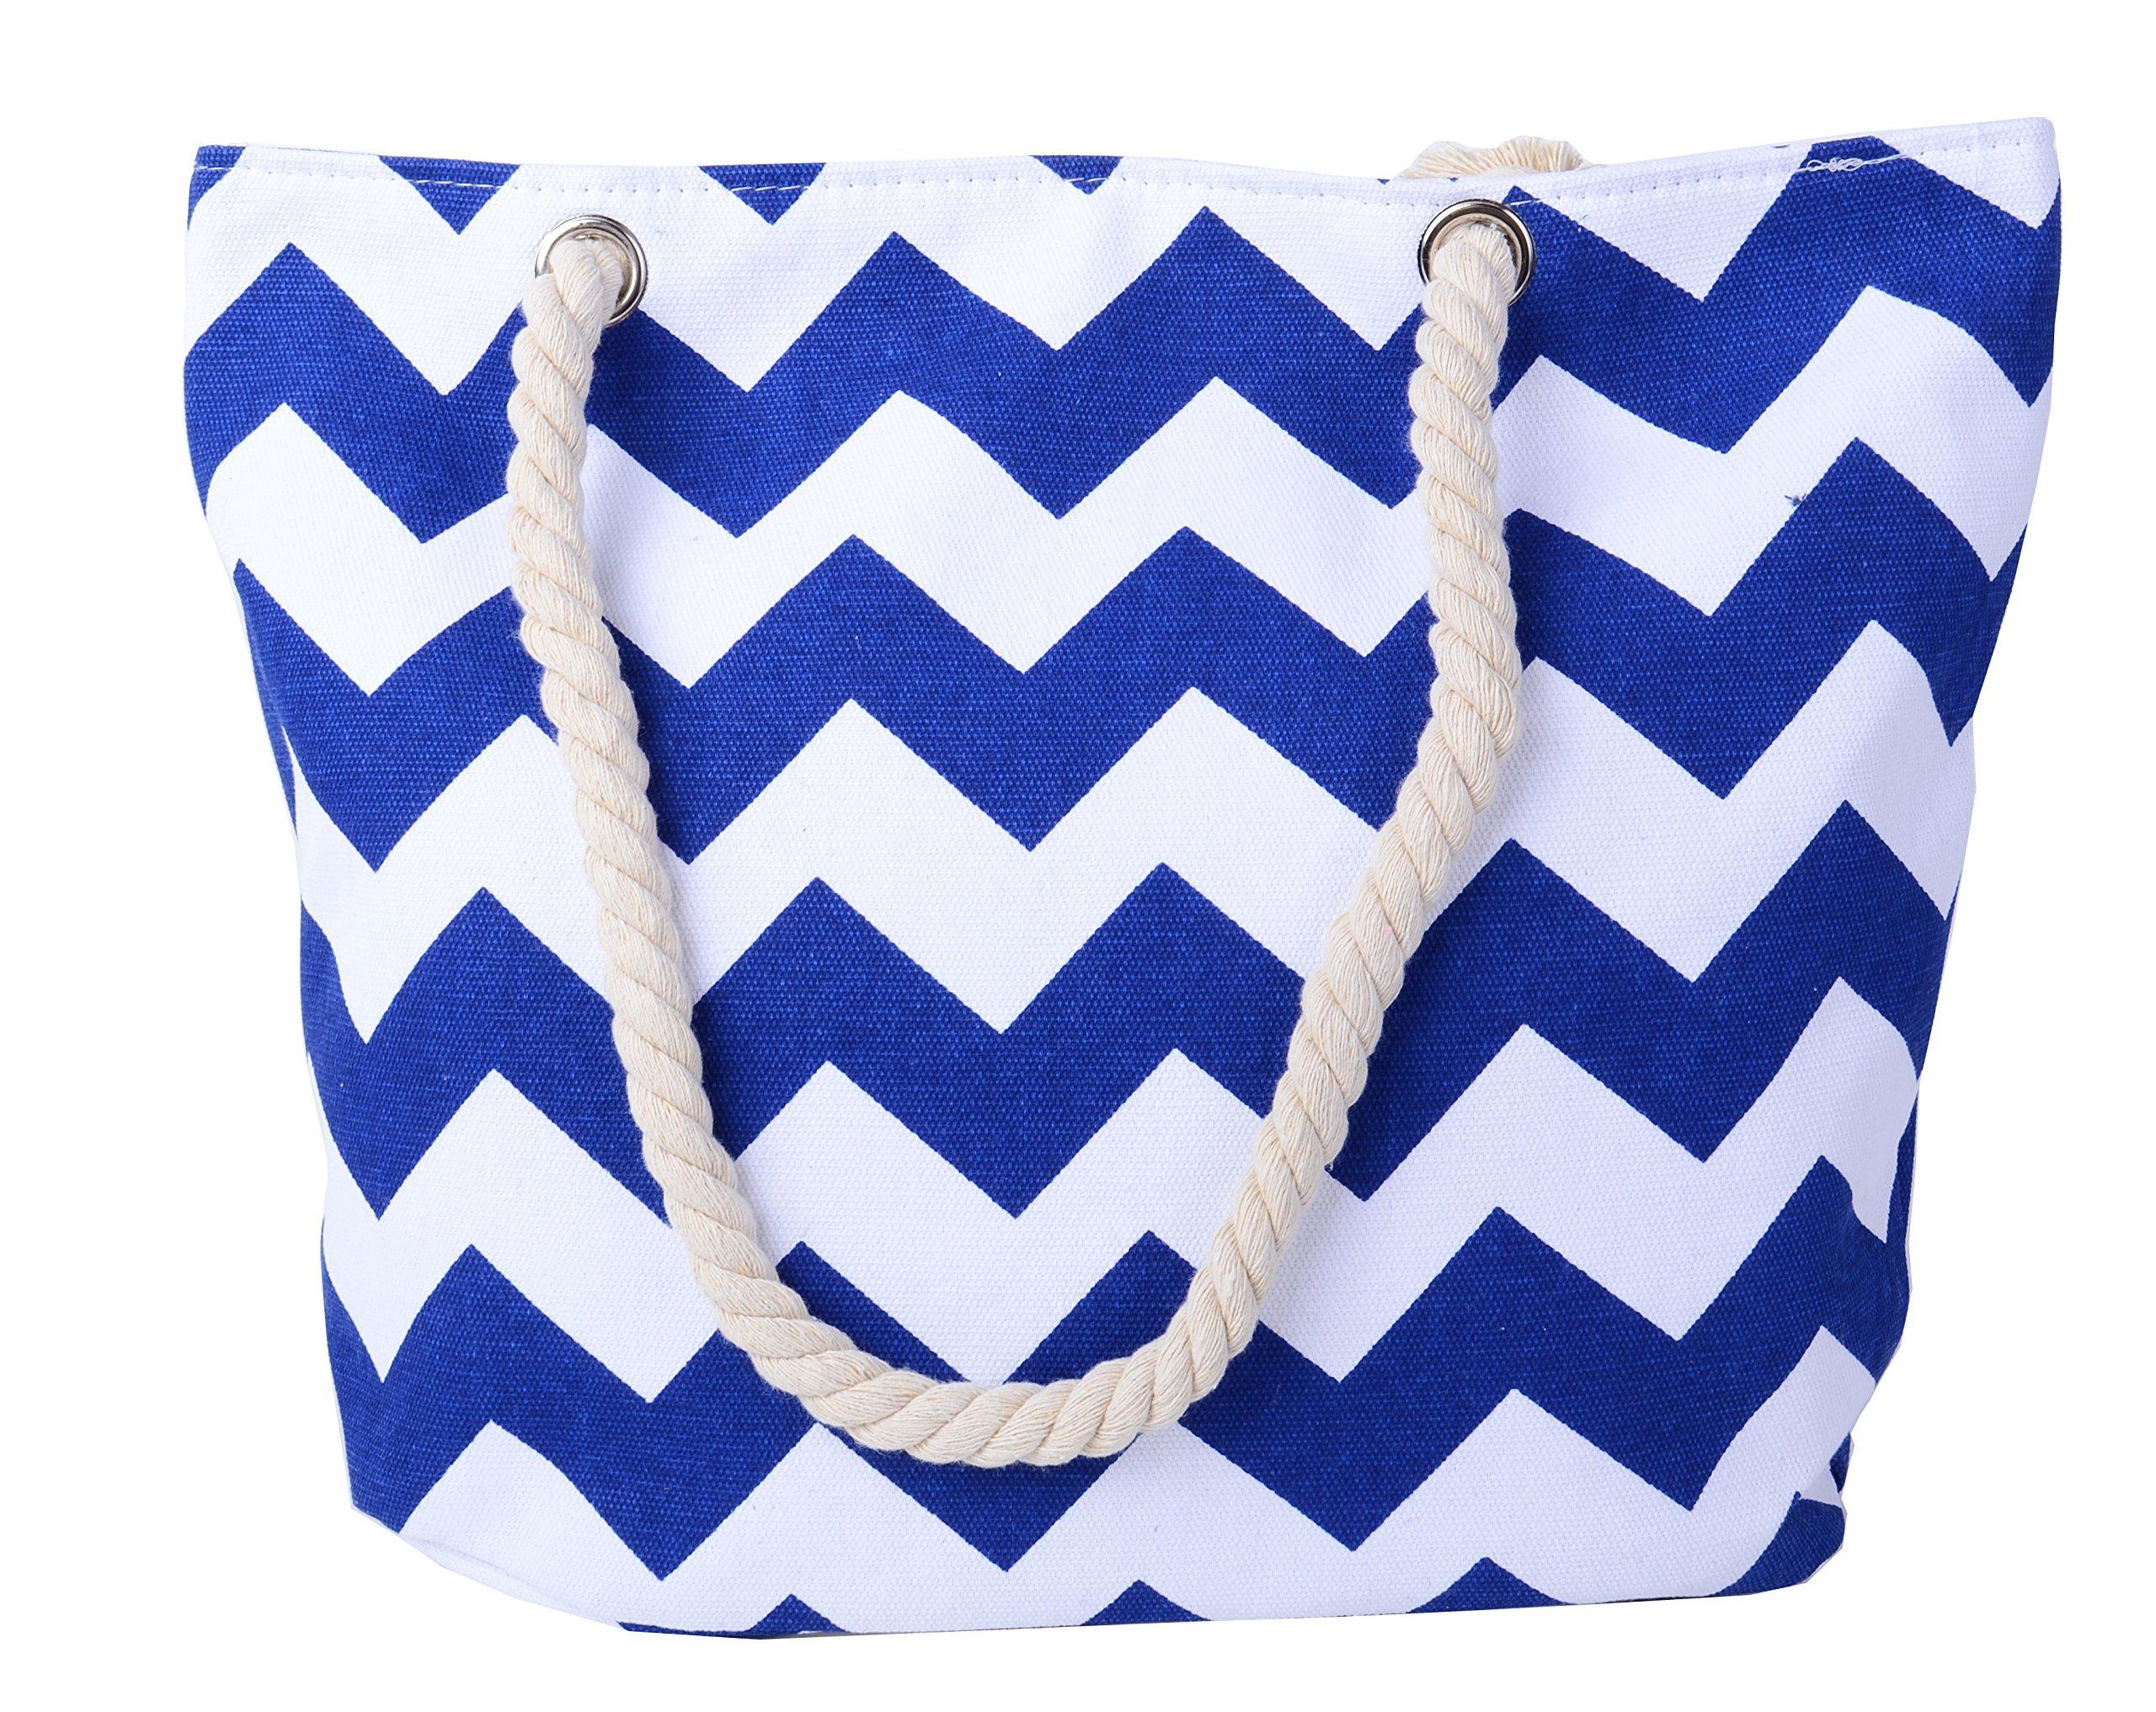 Pulama Womens Large Beach Tote Canvas Shoulder Bag Wave Striped Anchor Summer Handbag Top Handle Bag Straw Beach Bag Azul Blue Wave